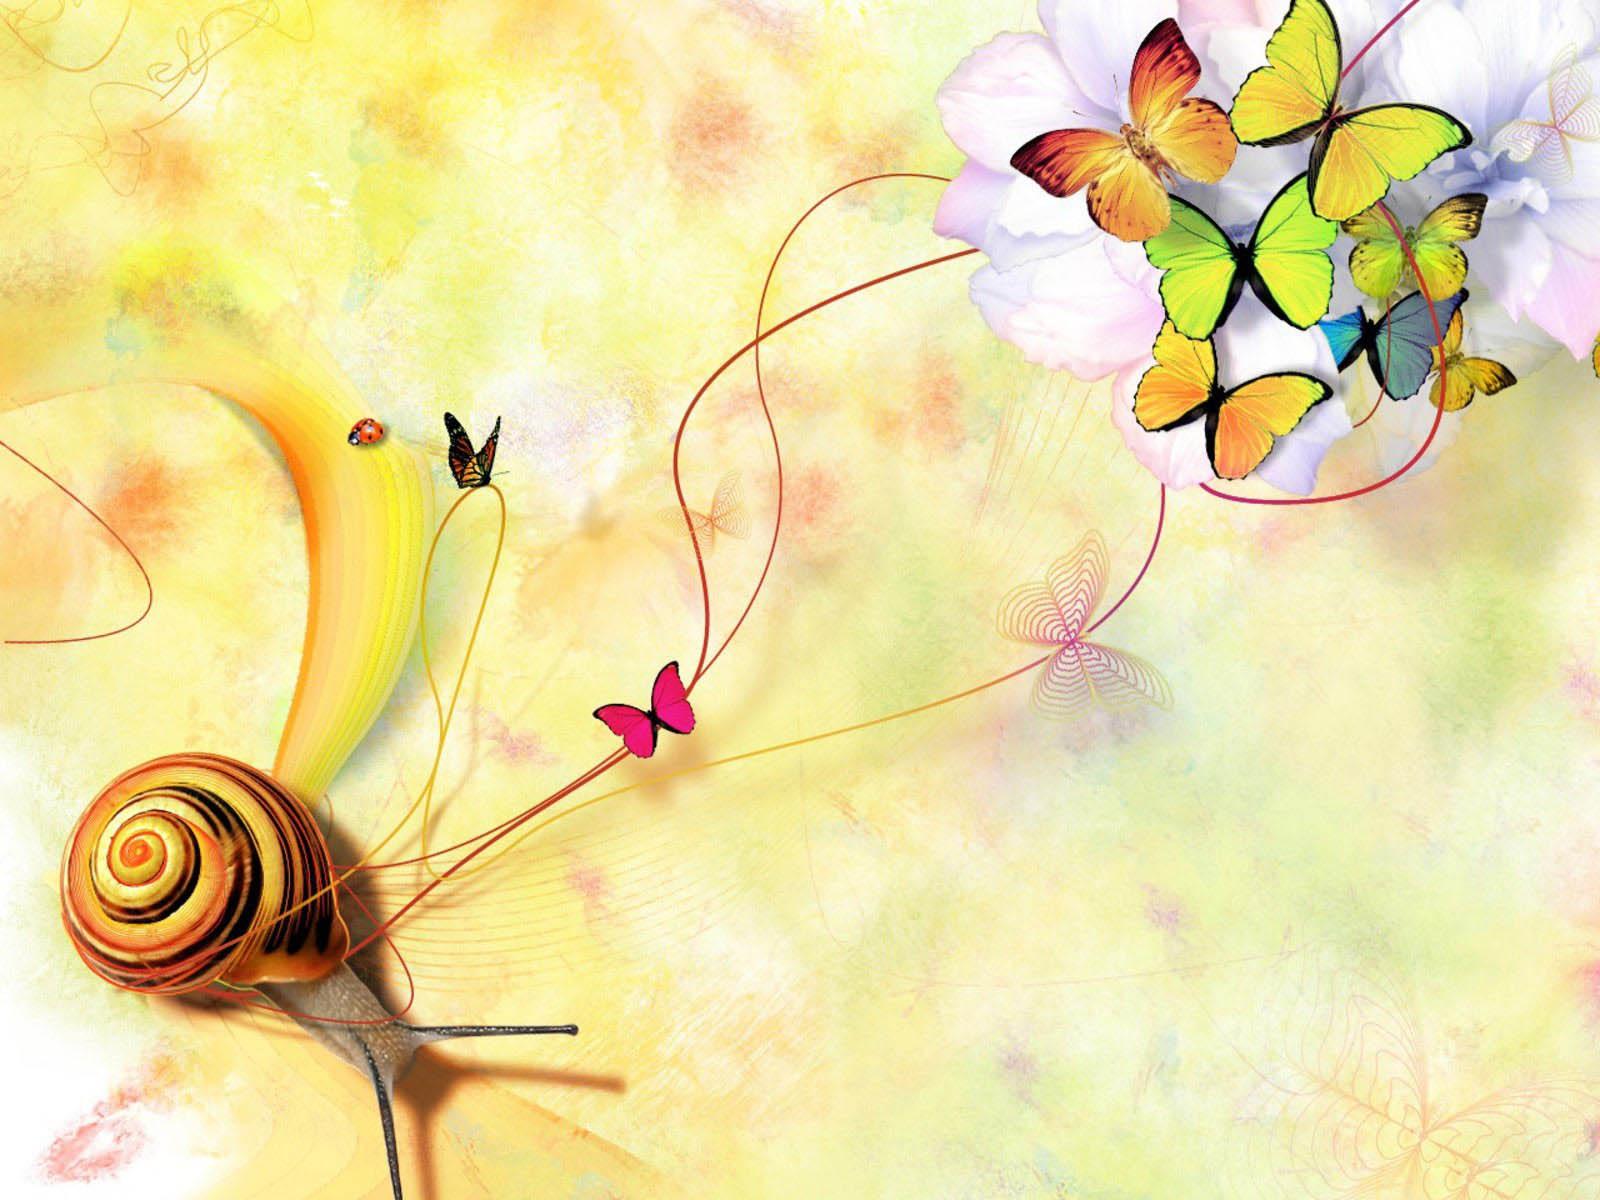 wallpapers: Digital Art Wallpapers